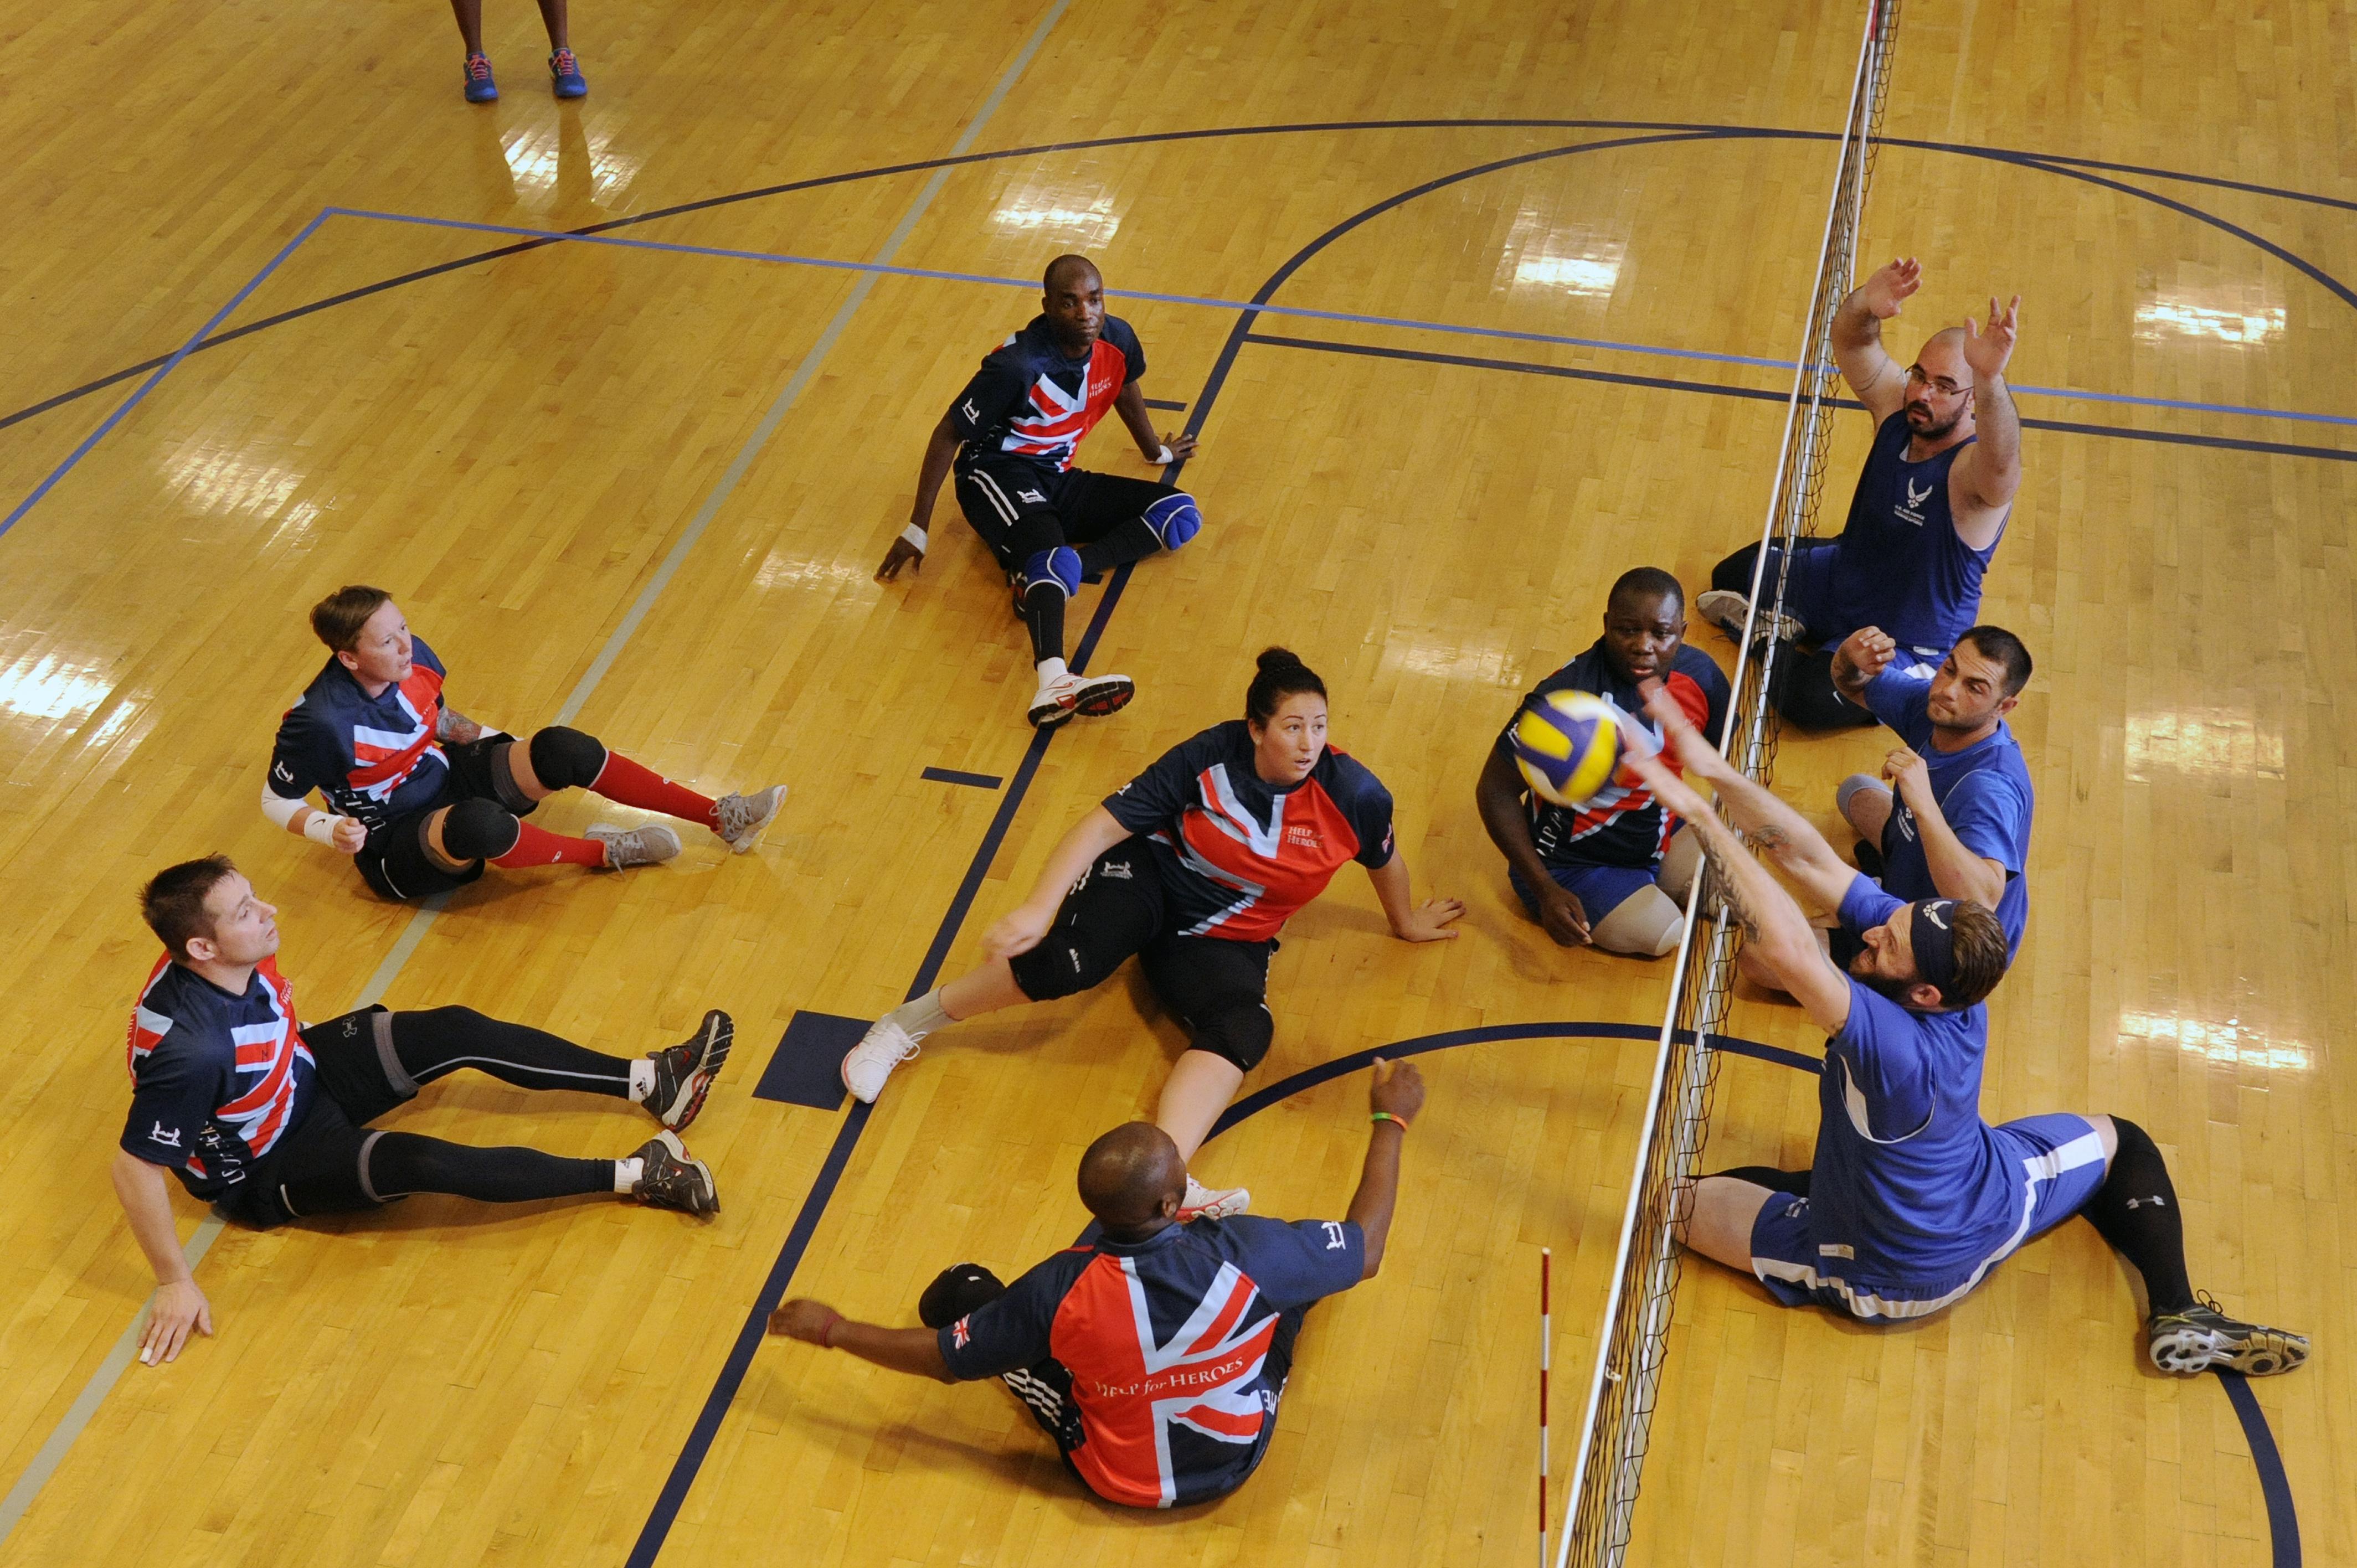 Multi-Sport Organizations